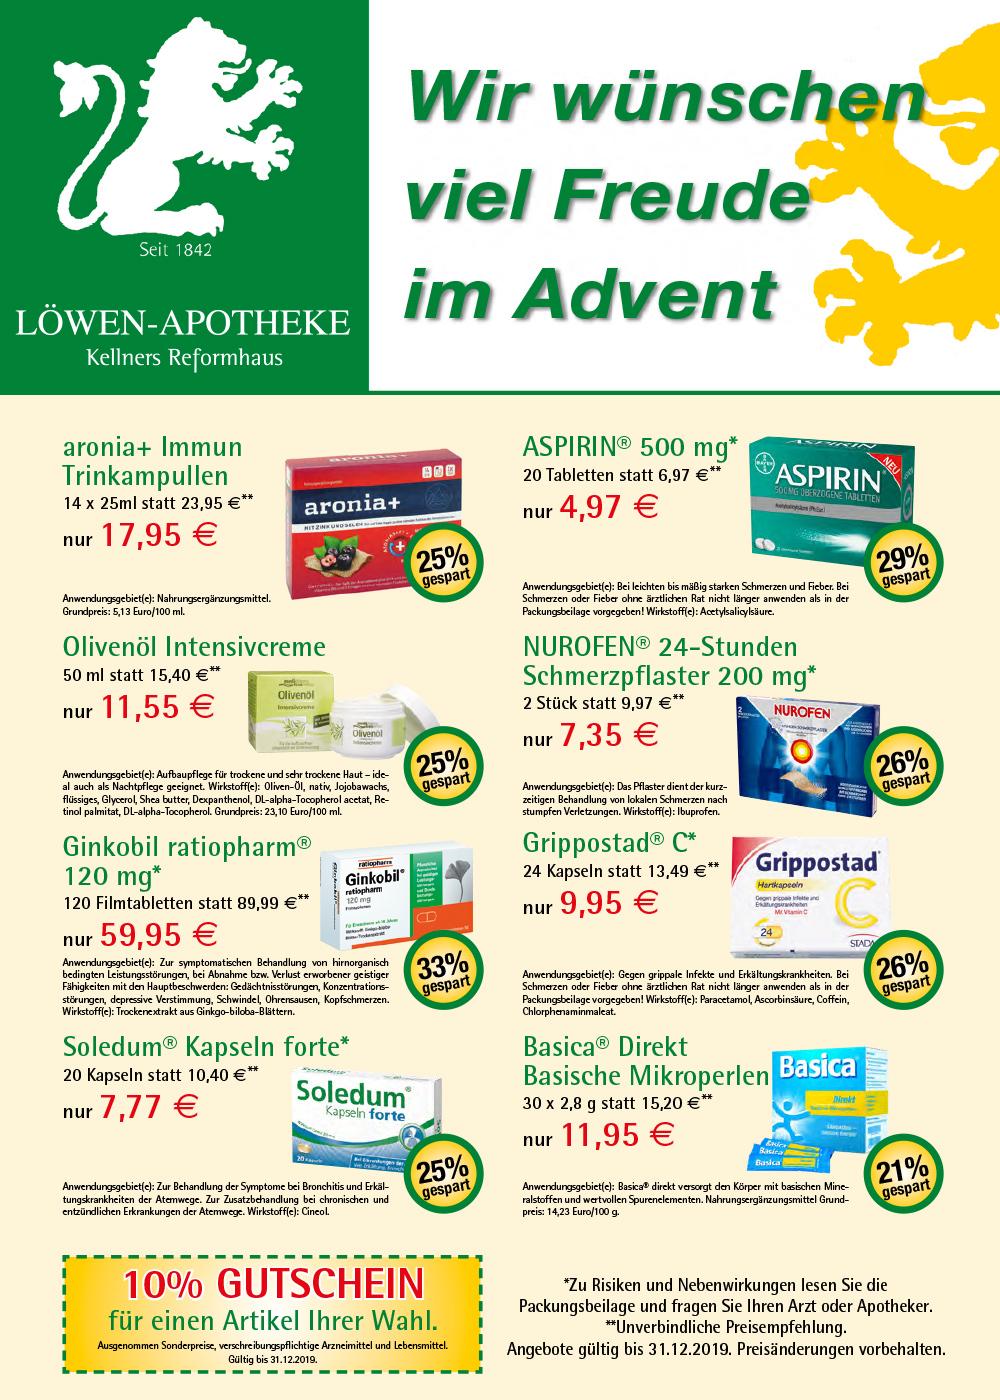 https://www.apotheken.de/fileadmin/clubarea/00000-Angebote/38159_loewen_angebot_5.jpg